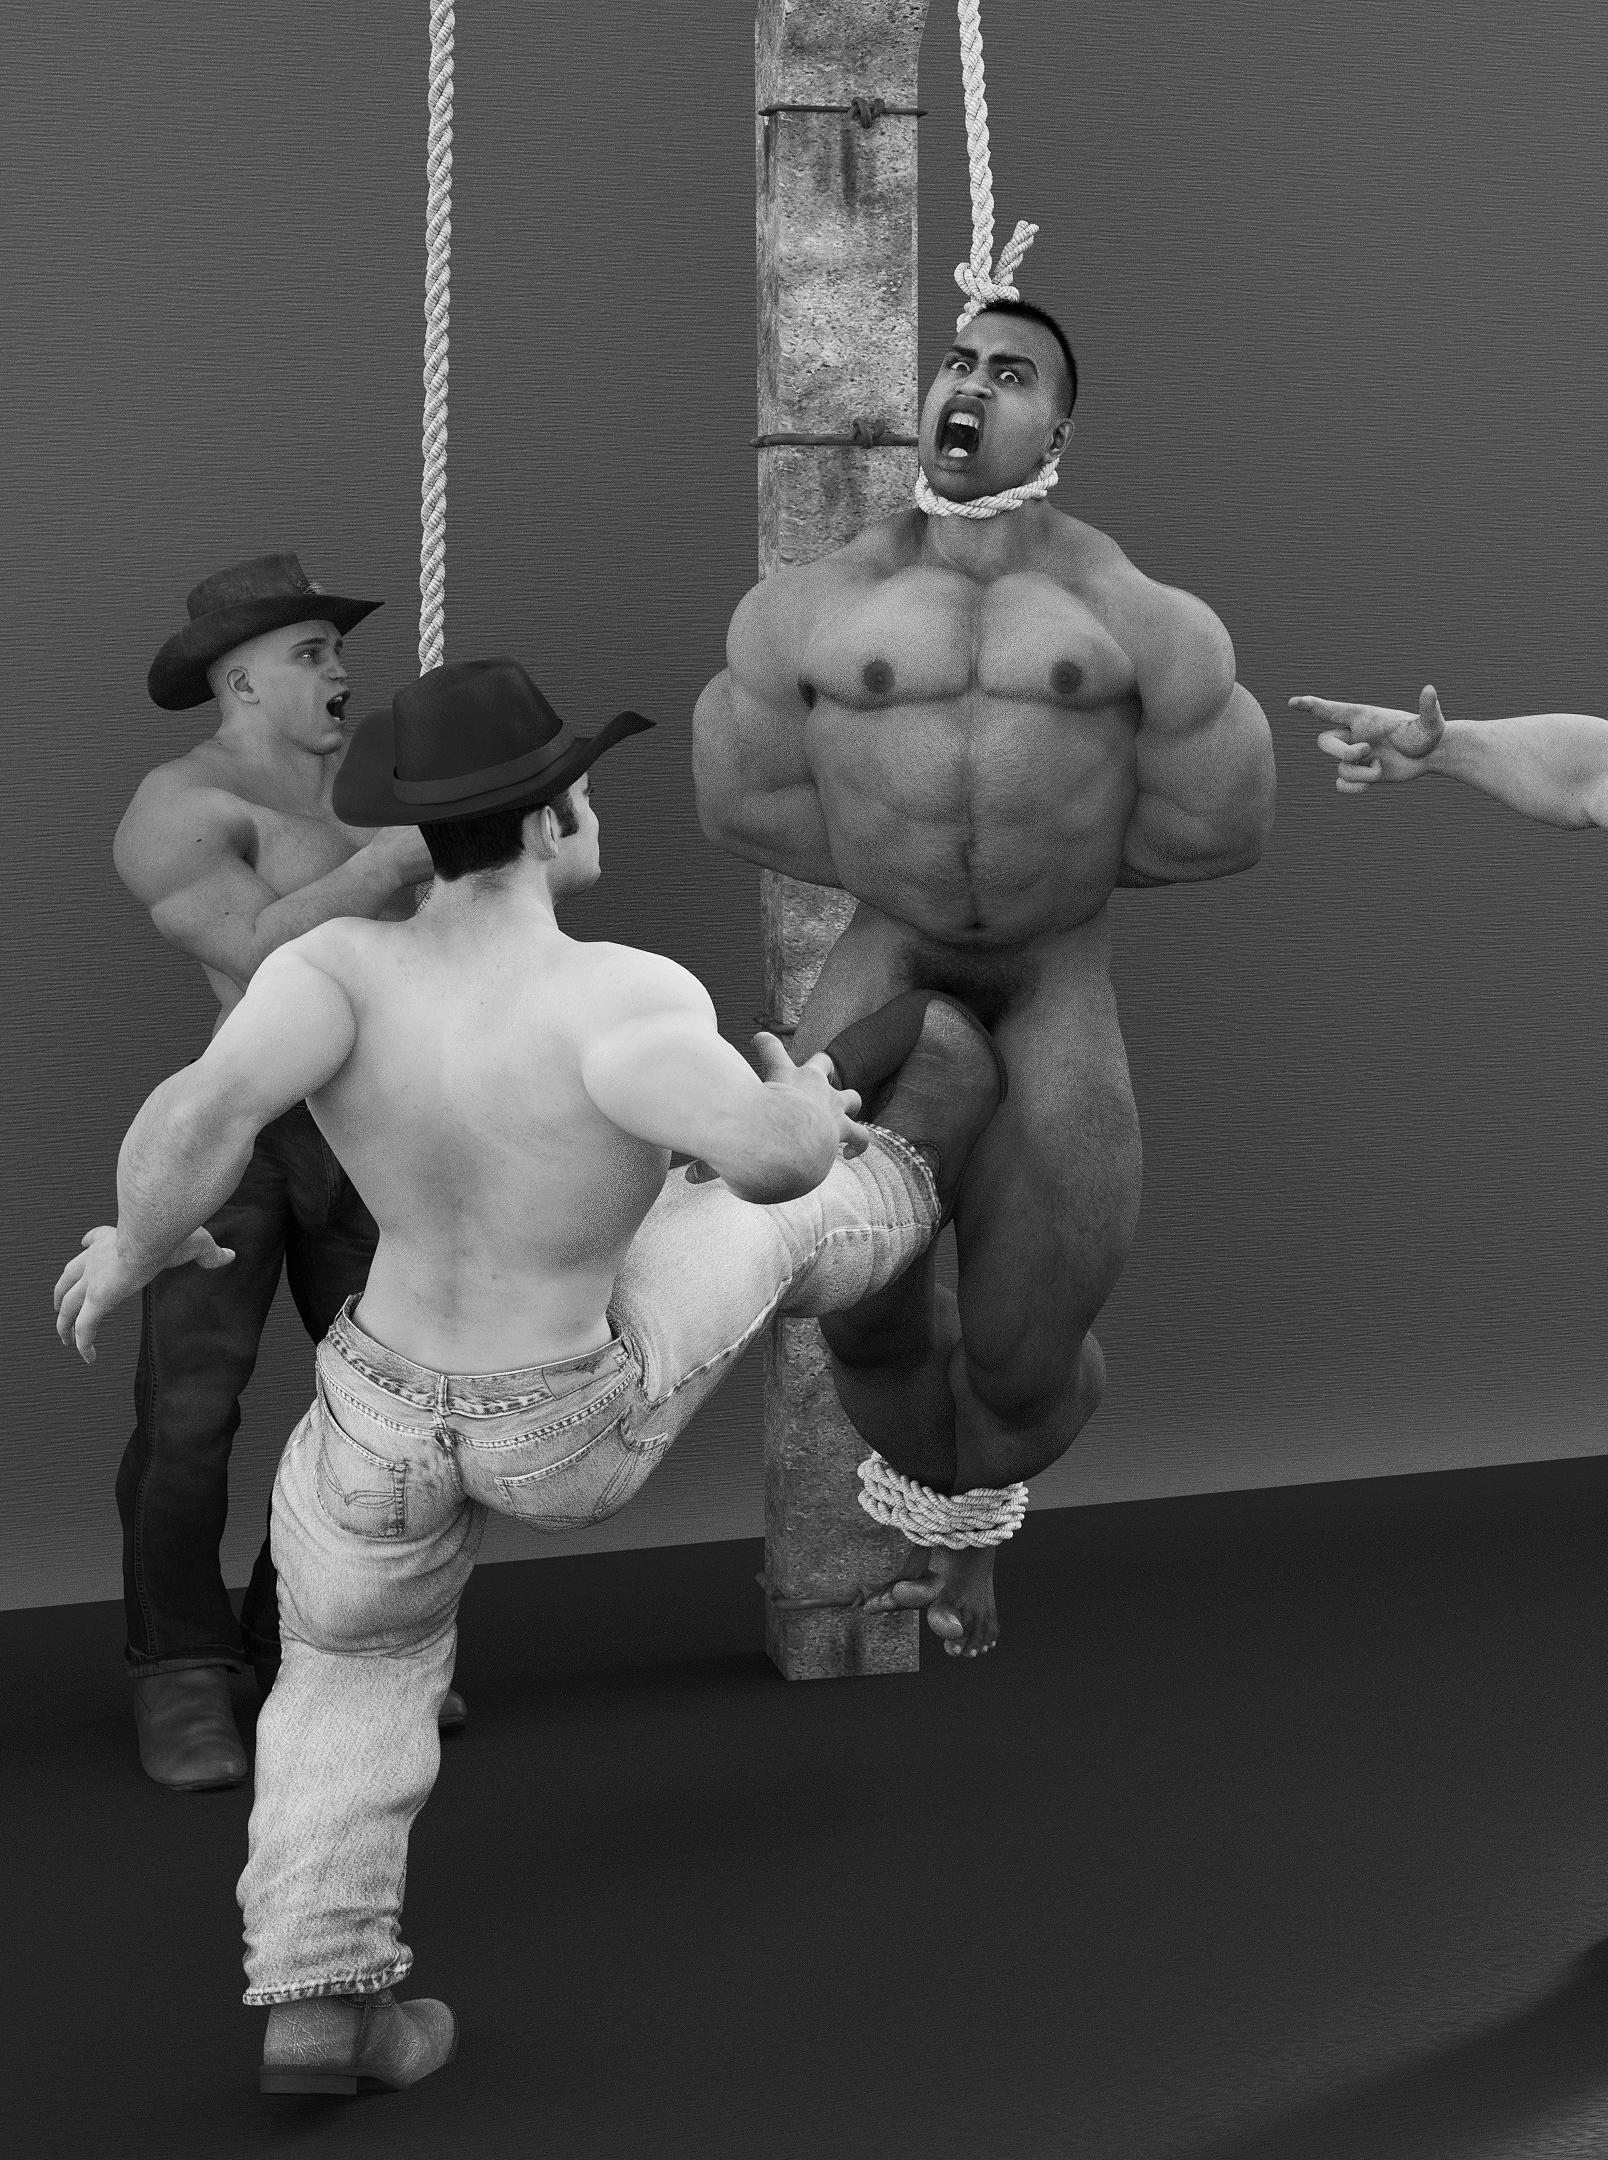 Hang him nude